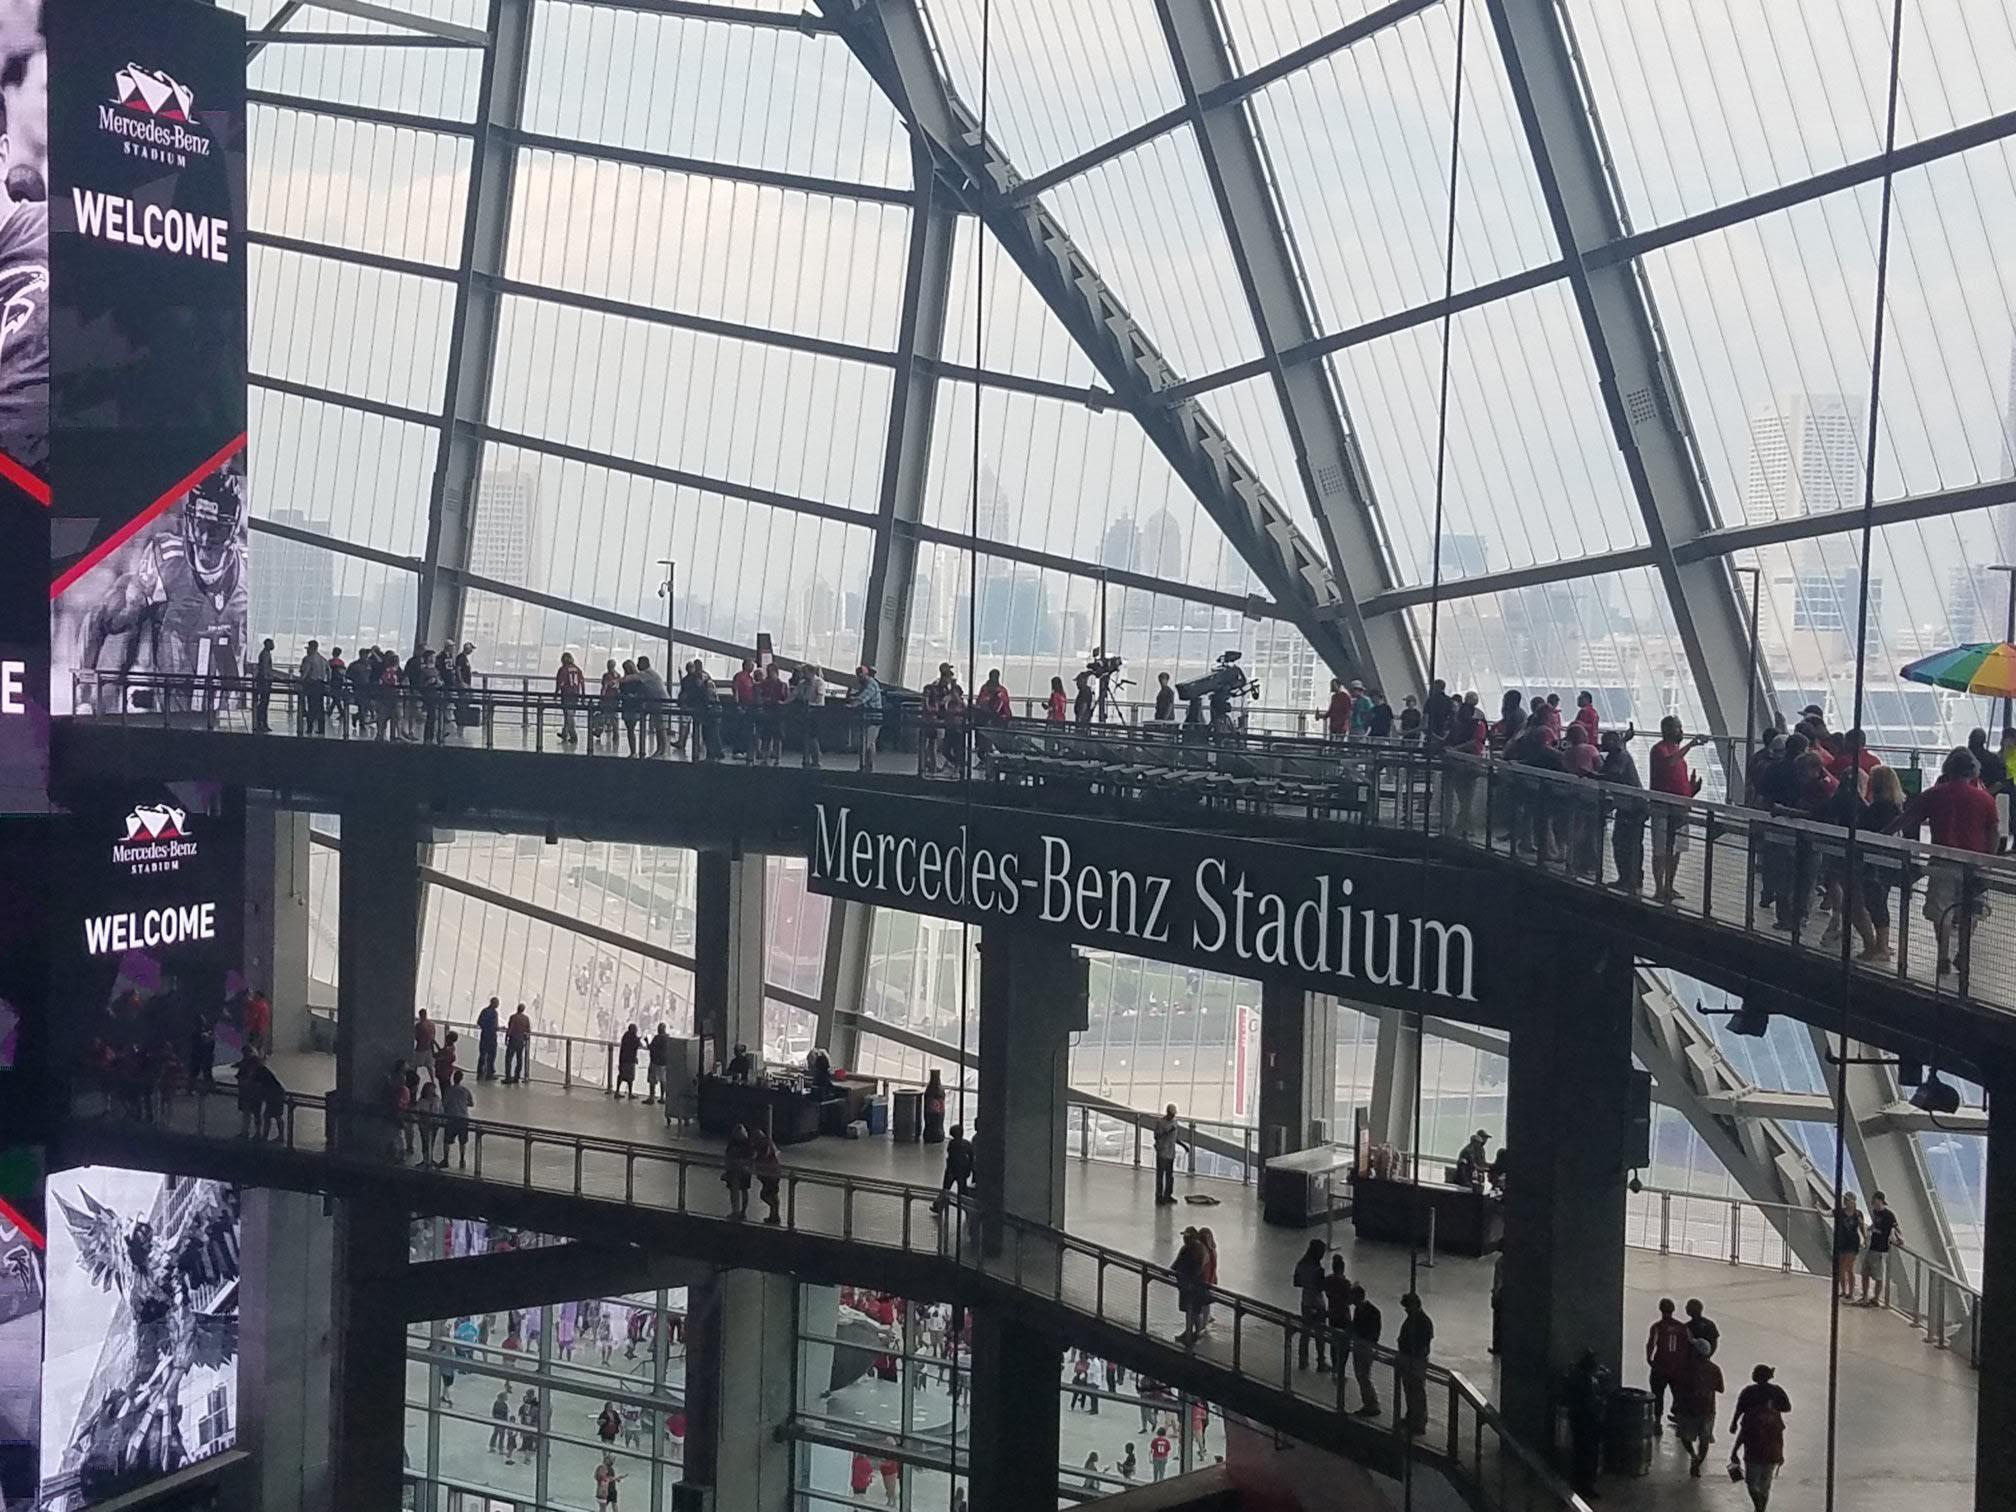 Atlanta Falcons Seating Guide Mercedes Benz Stadium